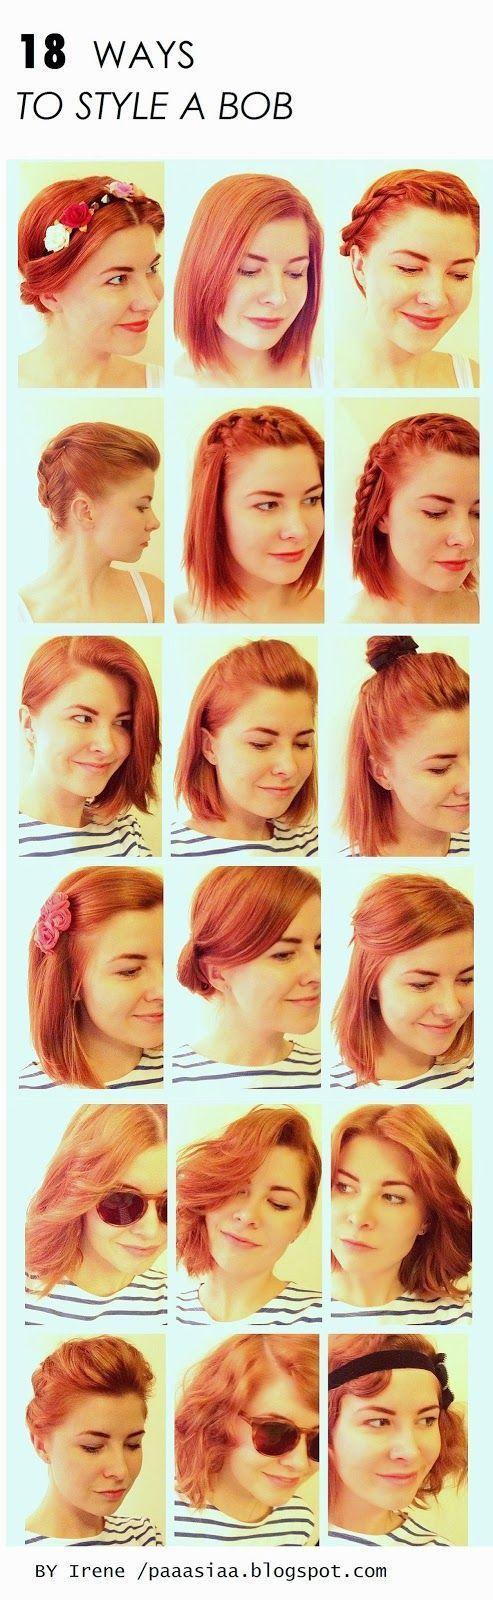 Hairstyles for short hair easyhairstylesshort easy hairstyles